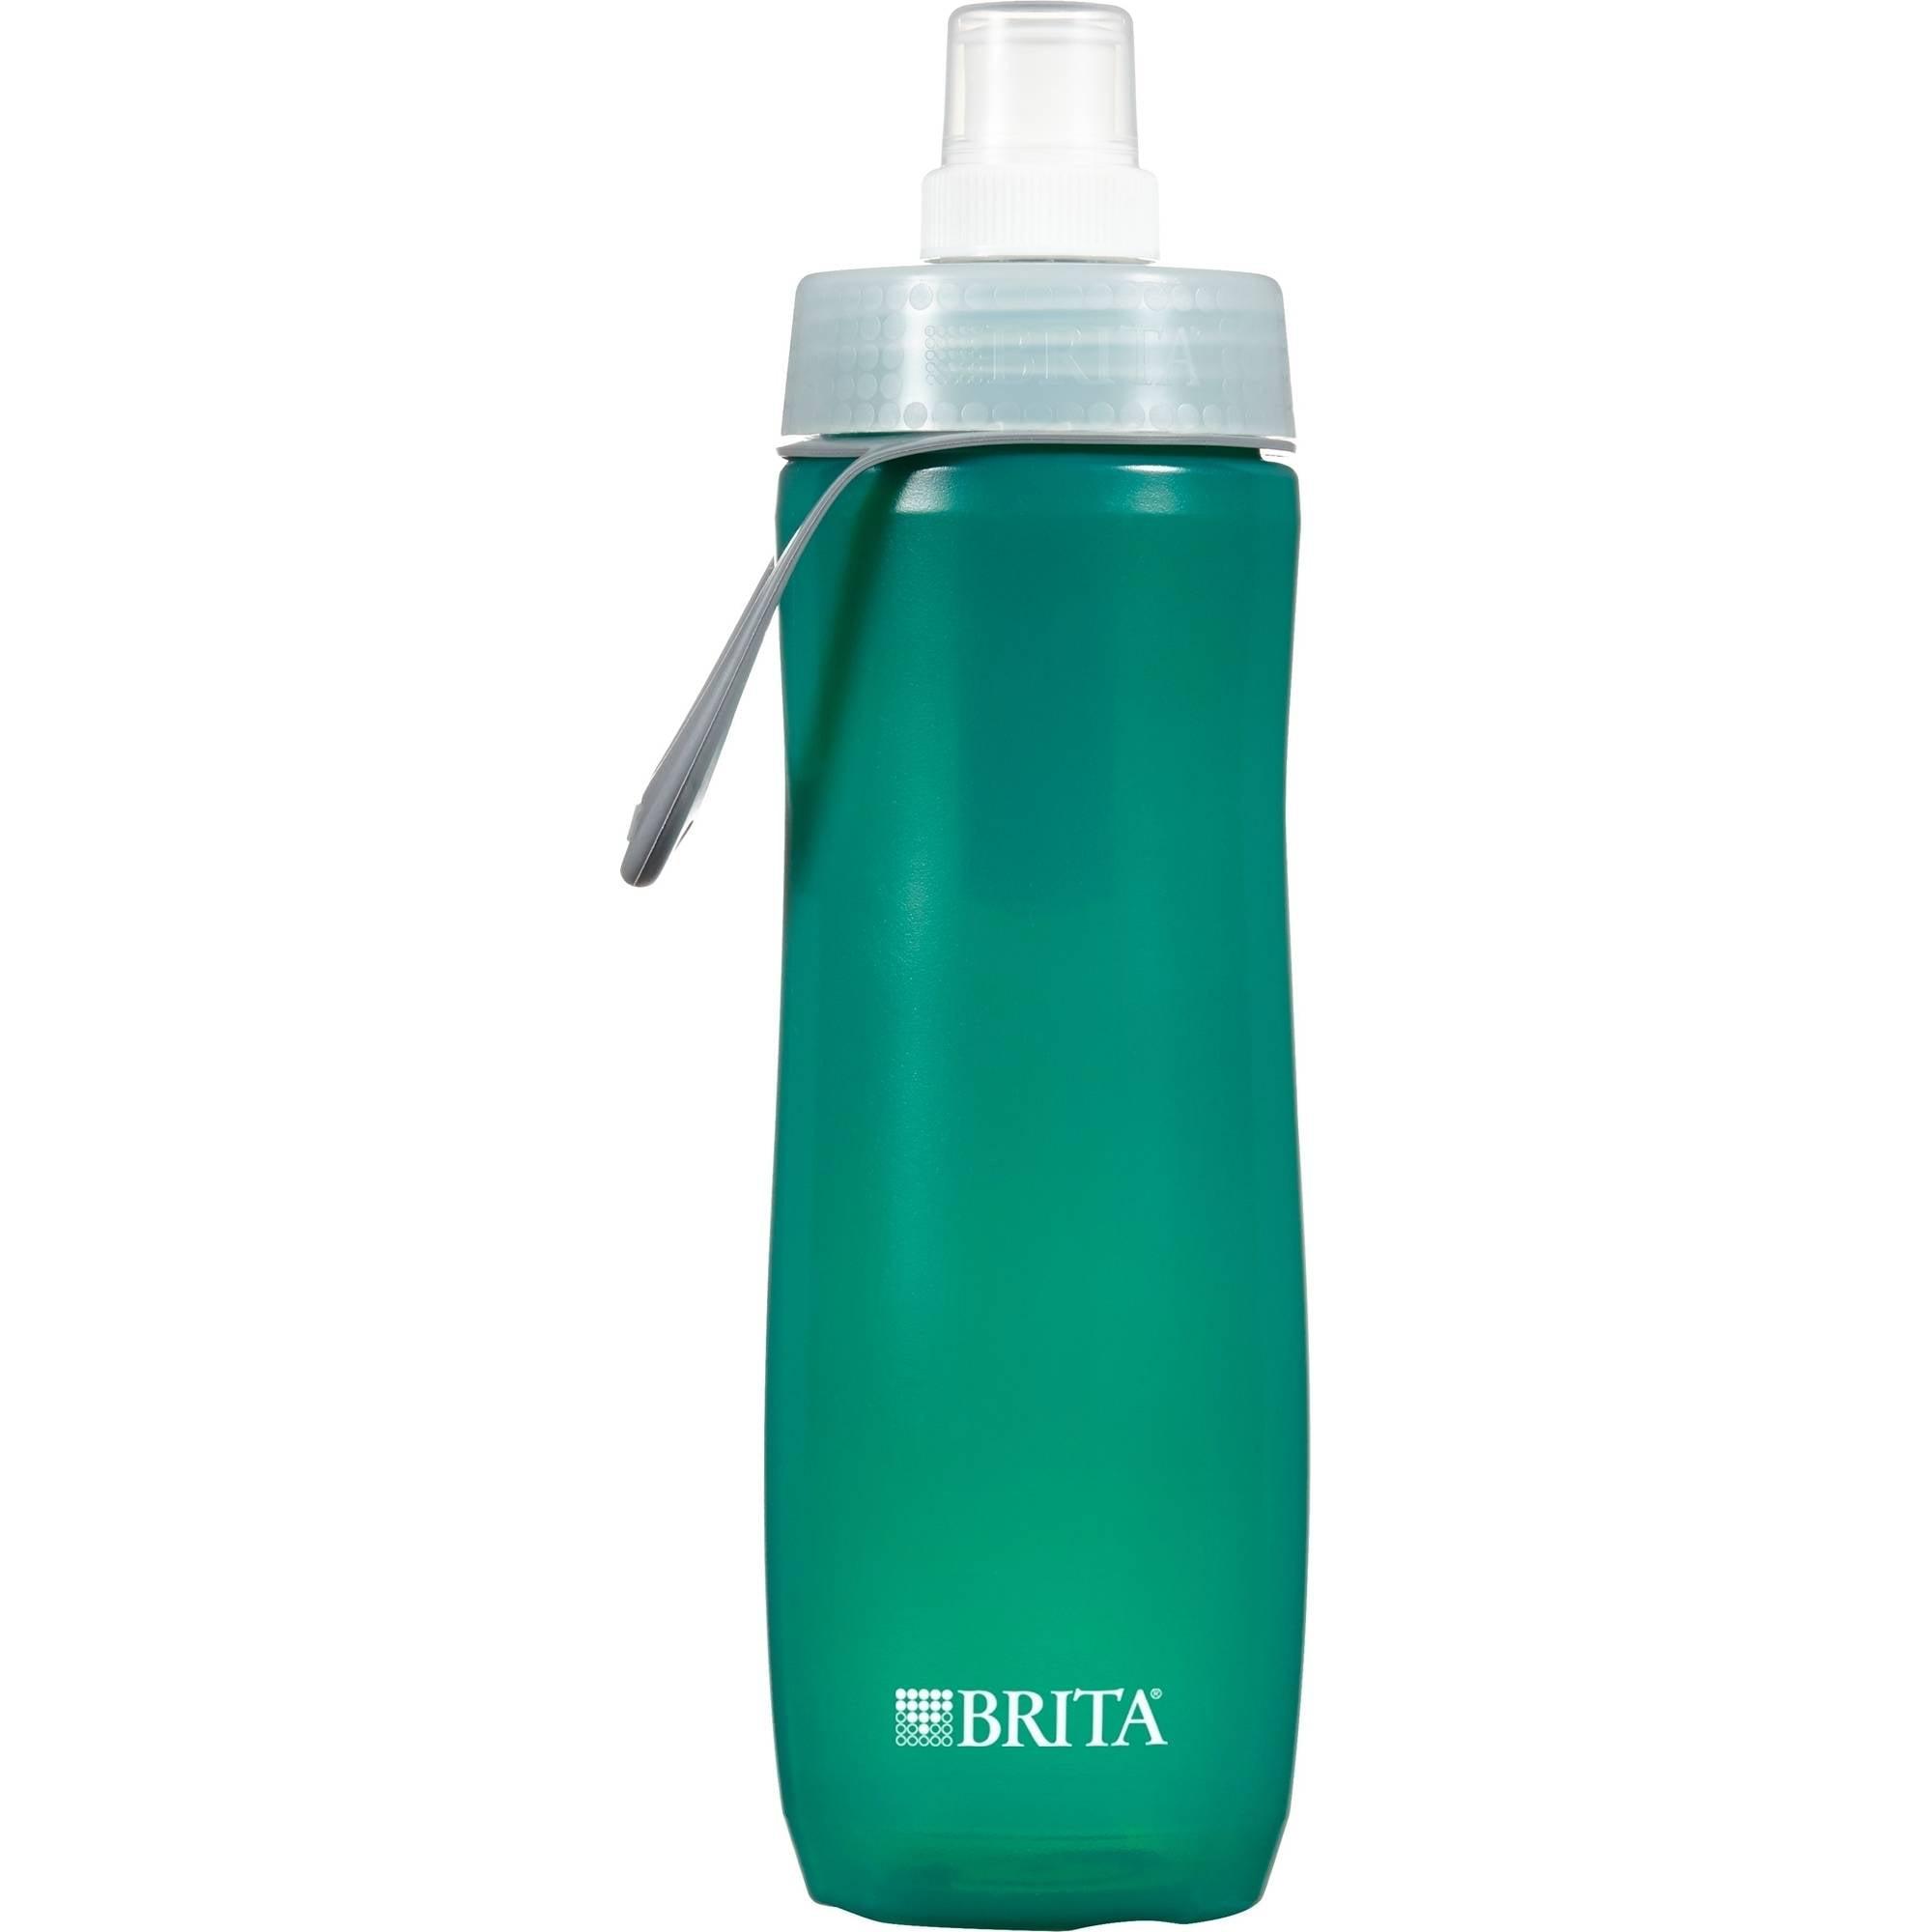 Brita Sport Water Filter Bottle, Dark Green, 20 ounce, BPA Free